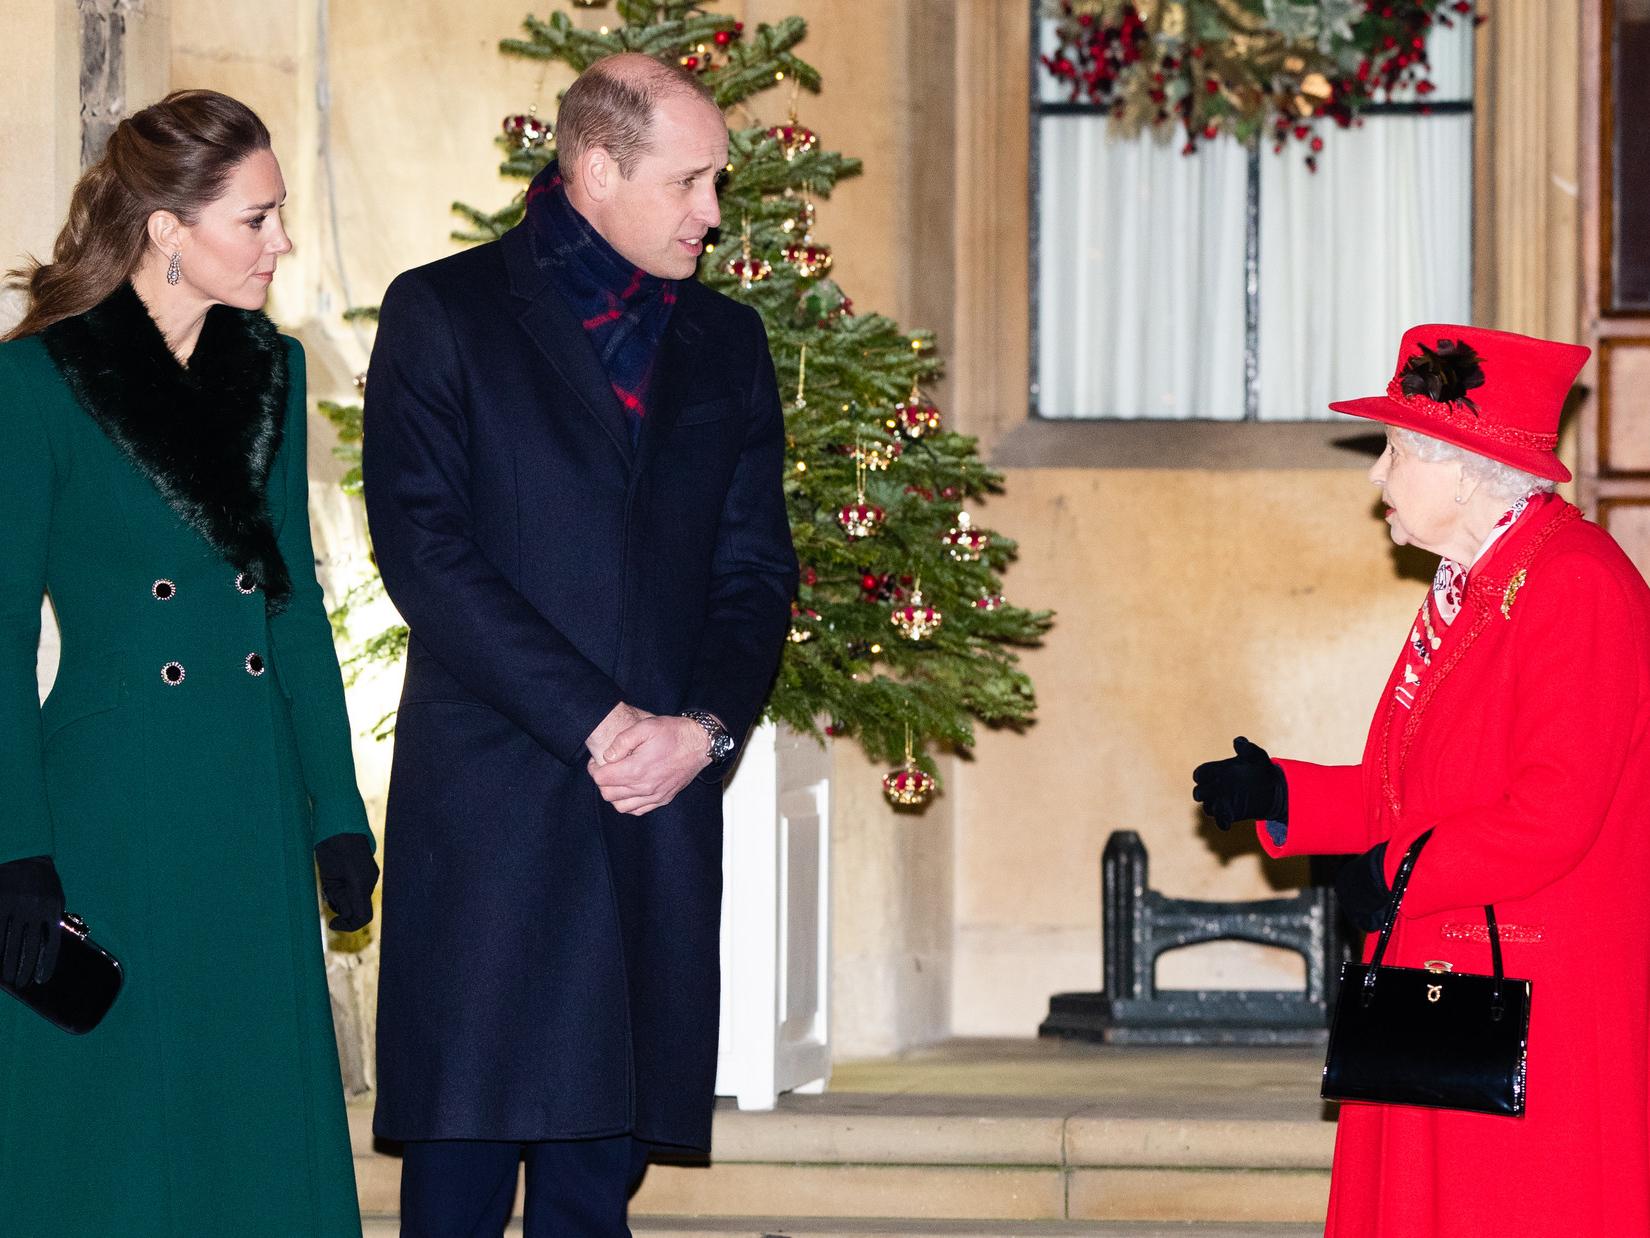 Герцоги Кембриджские нарушили традиции